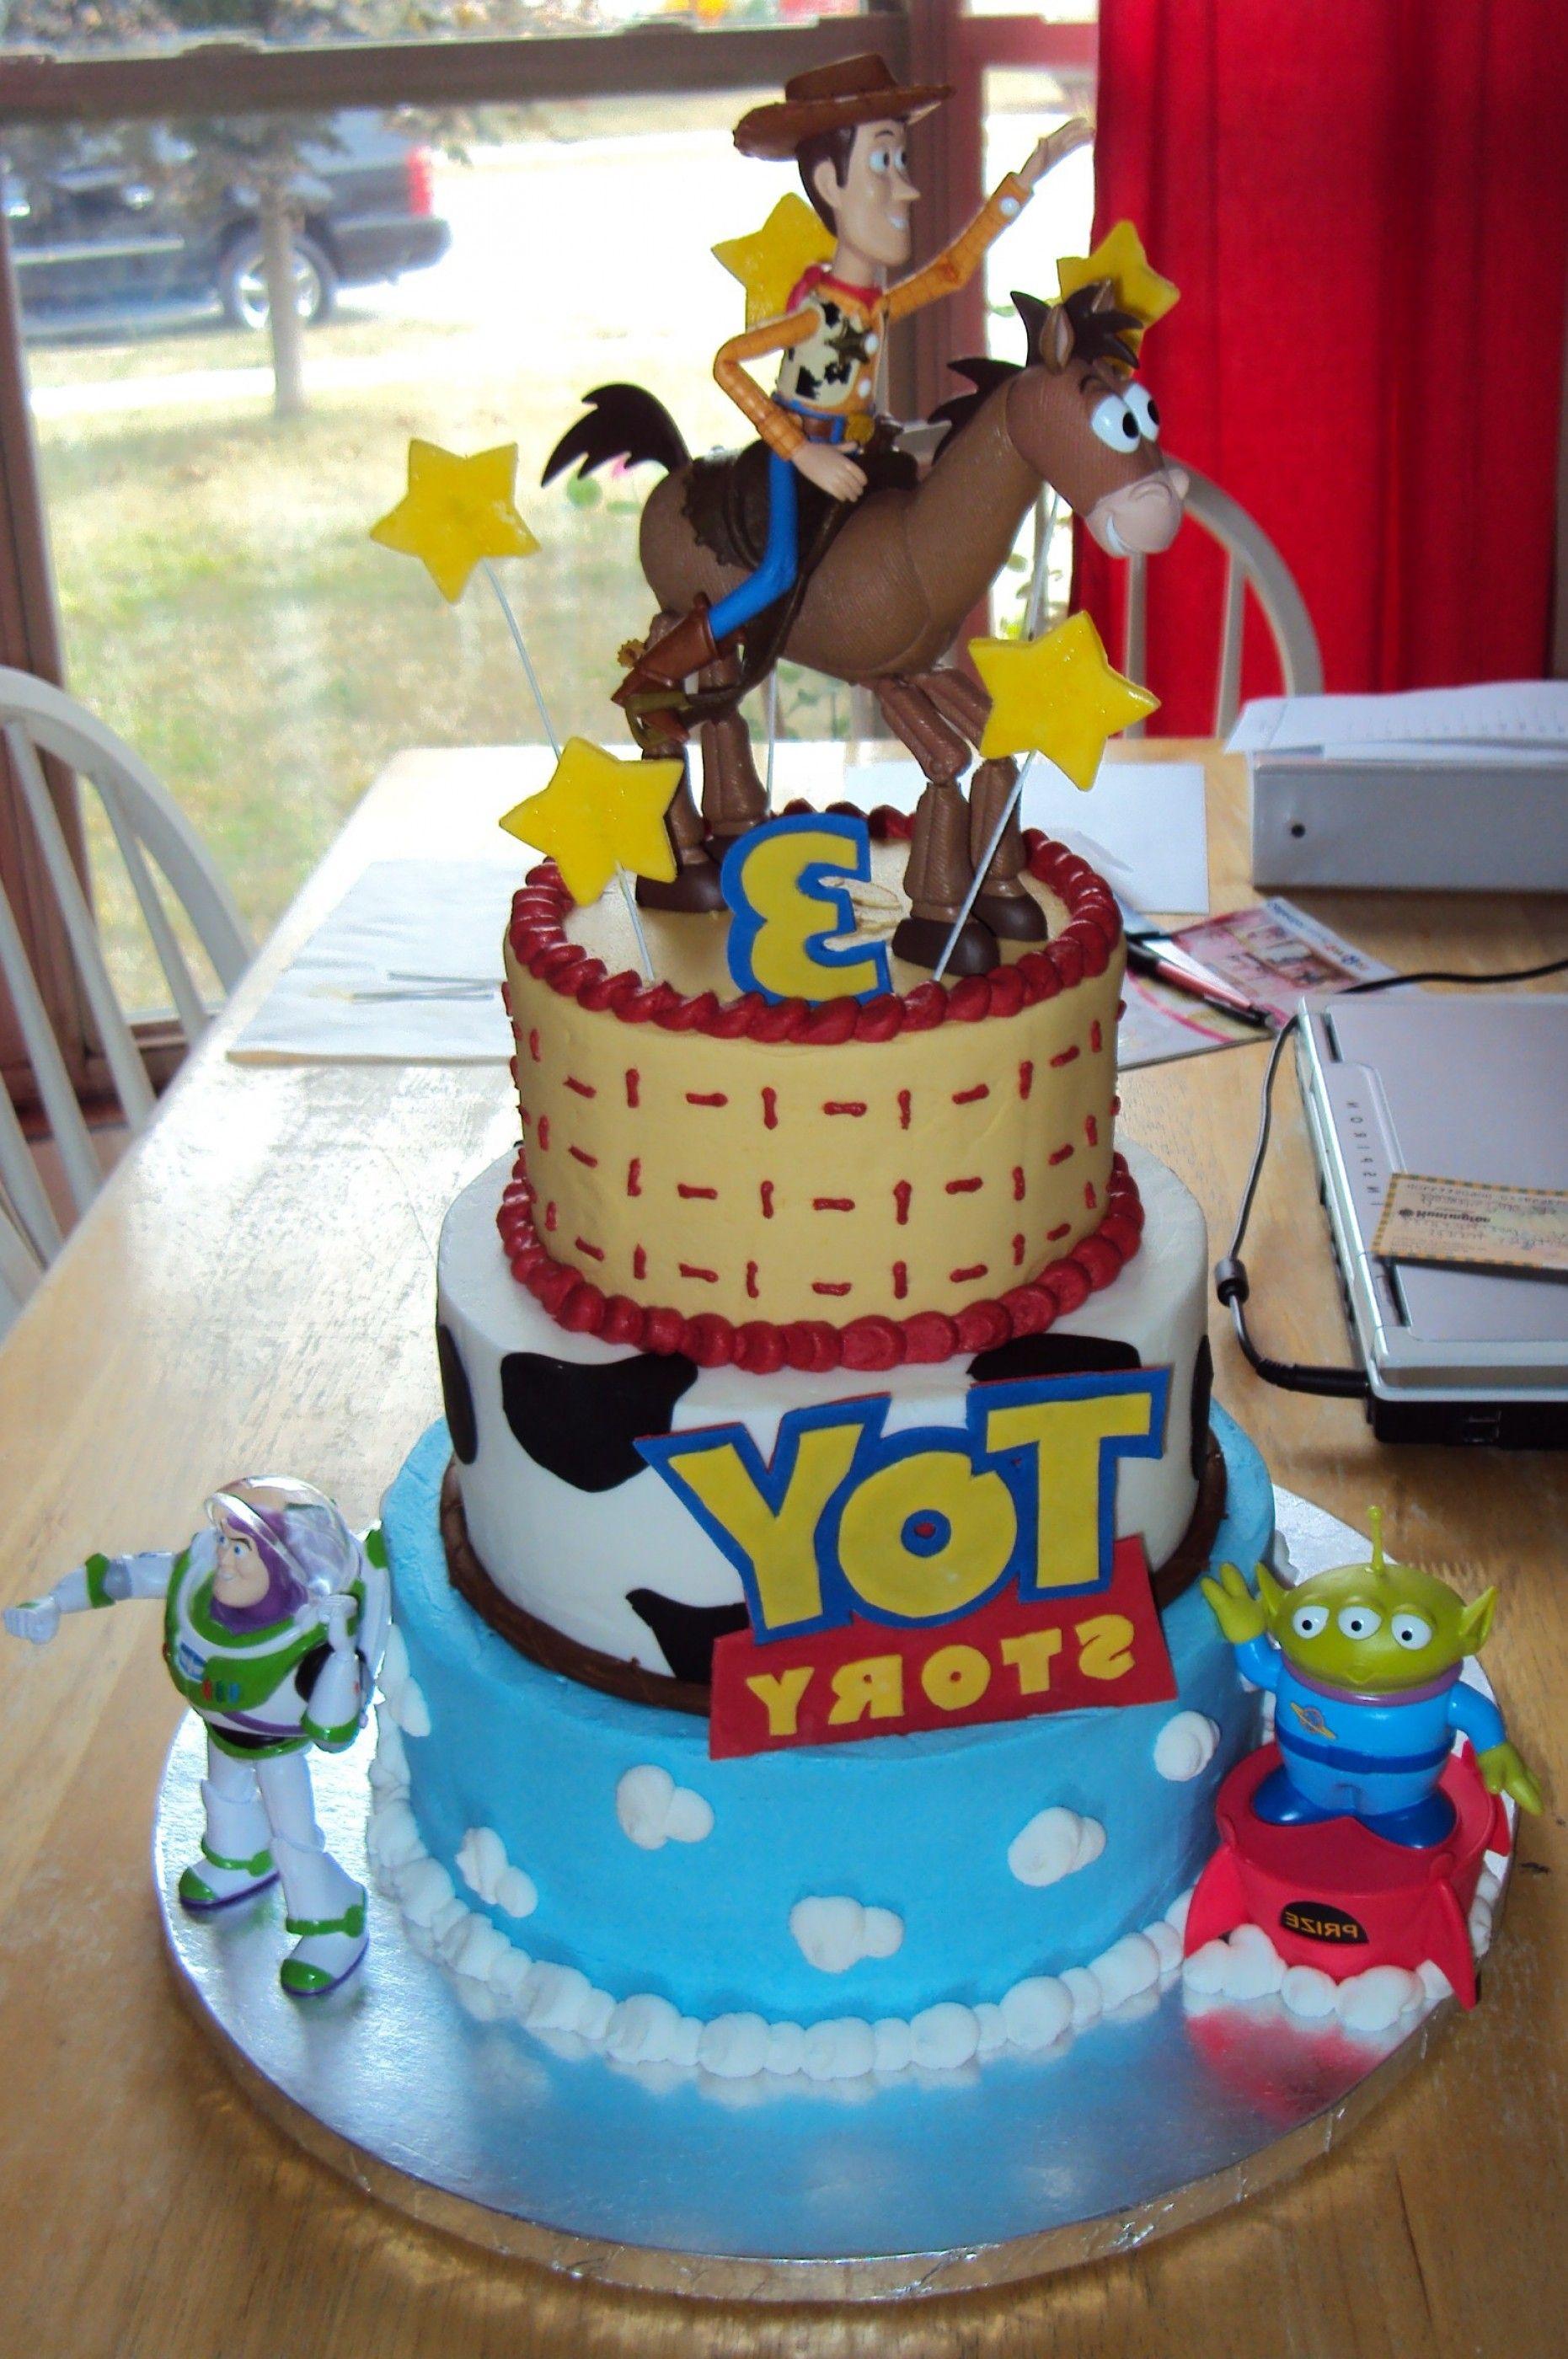 23 Best Image Of Walmart Cakes For Birthday Cake Designs Bakery Wedding